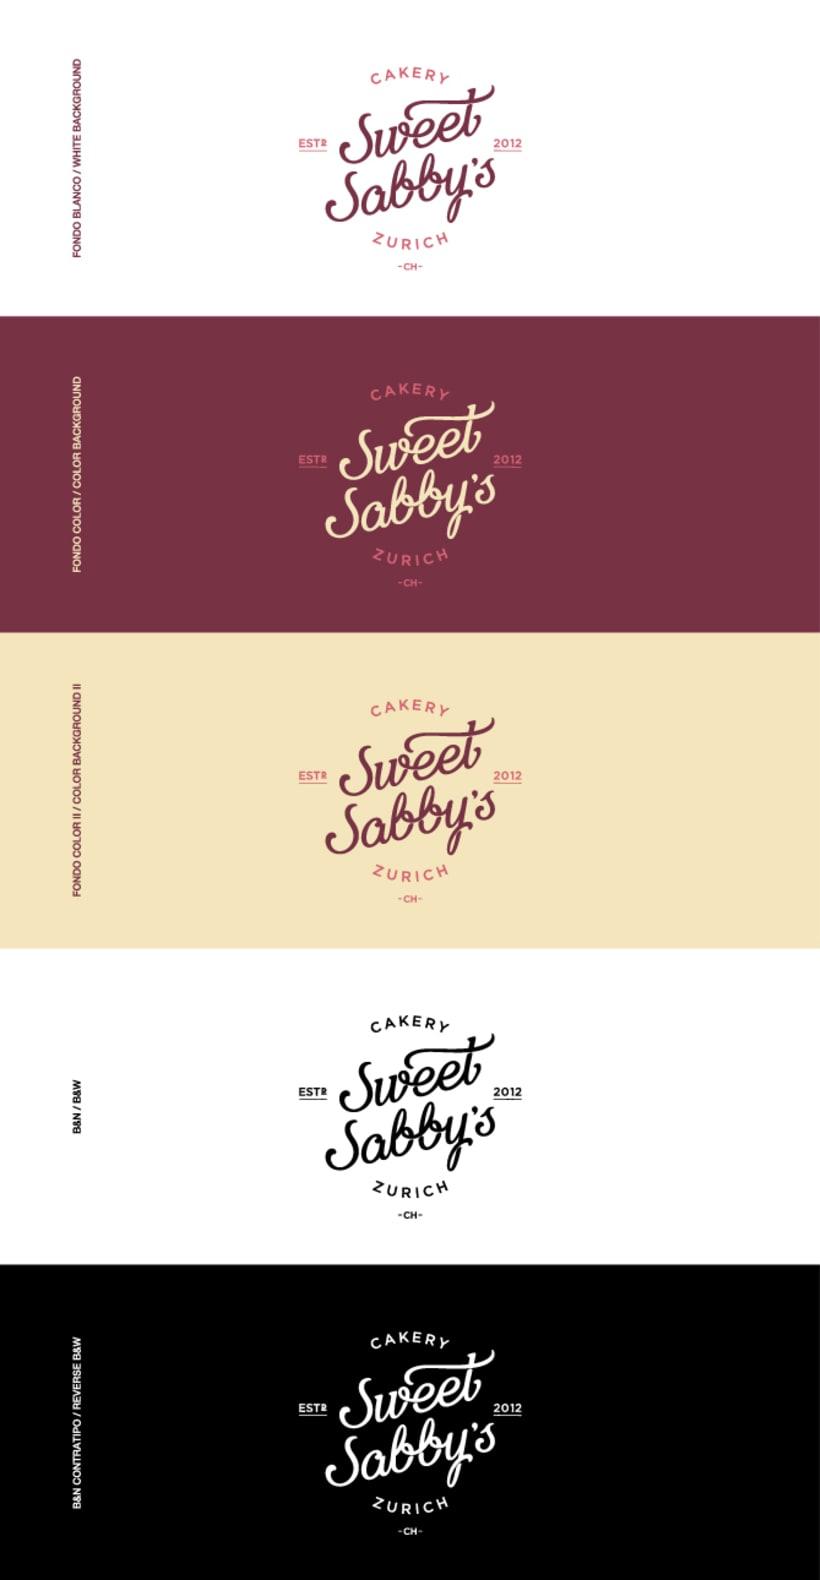 Sweet Sabbys 10